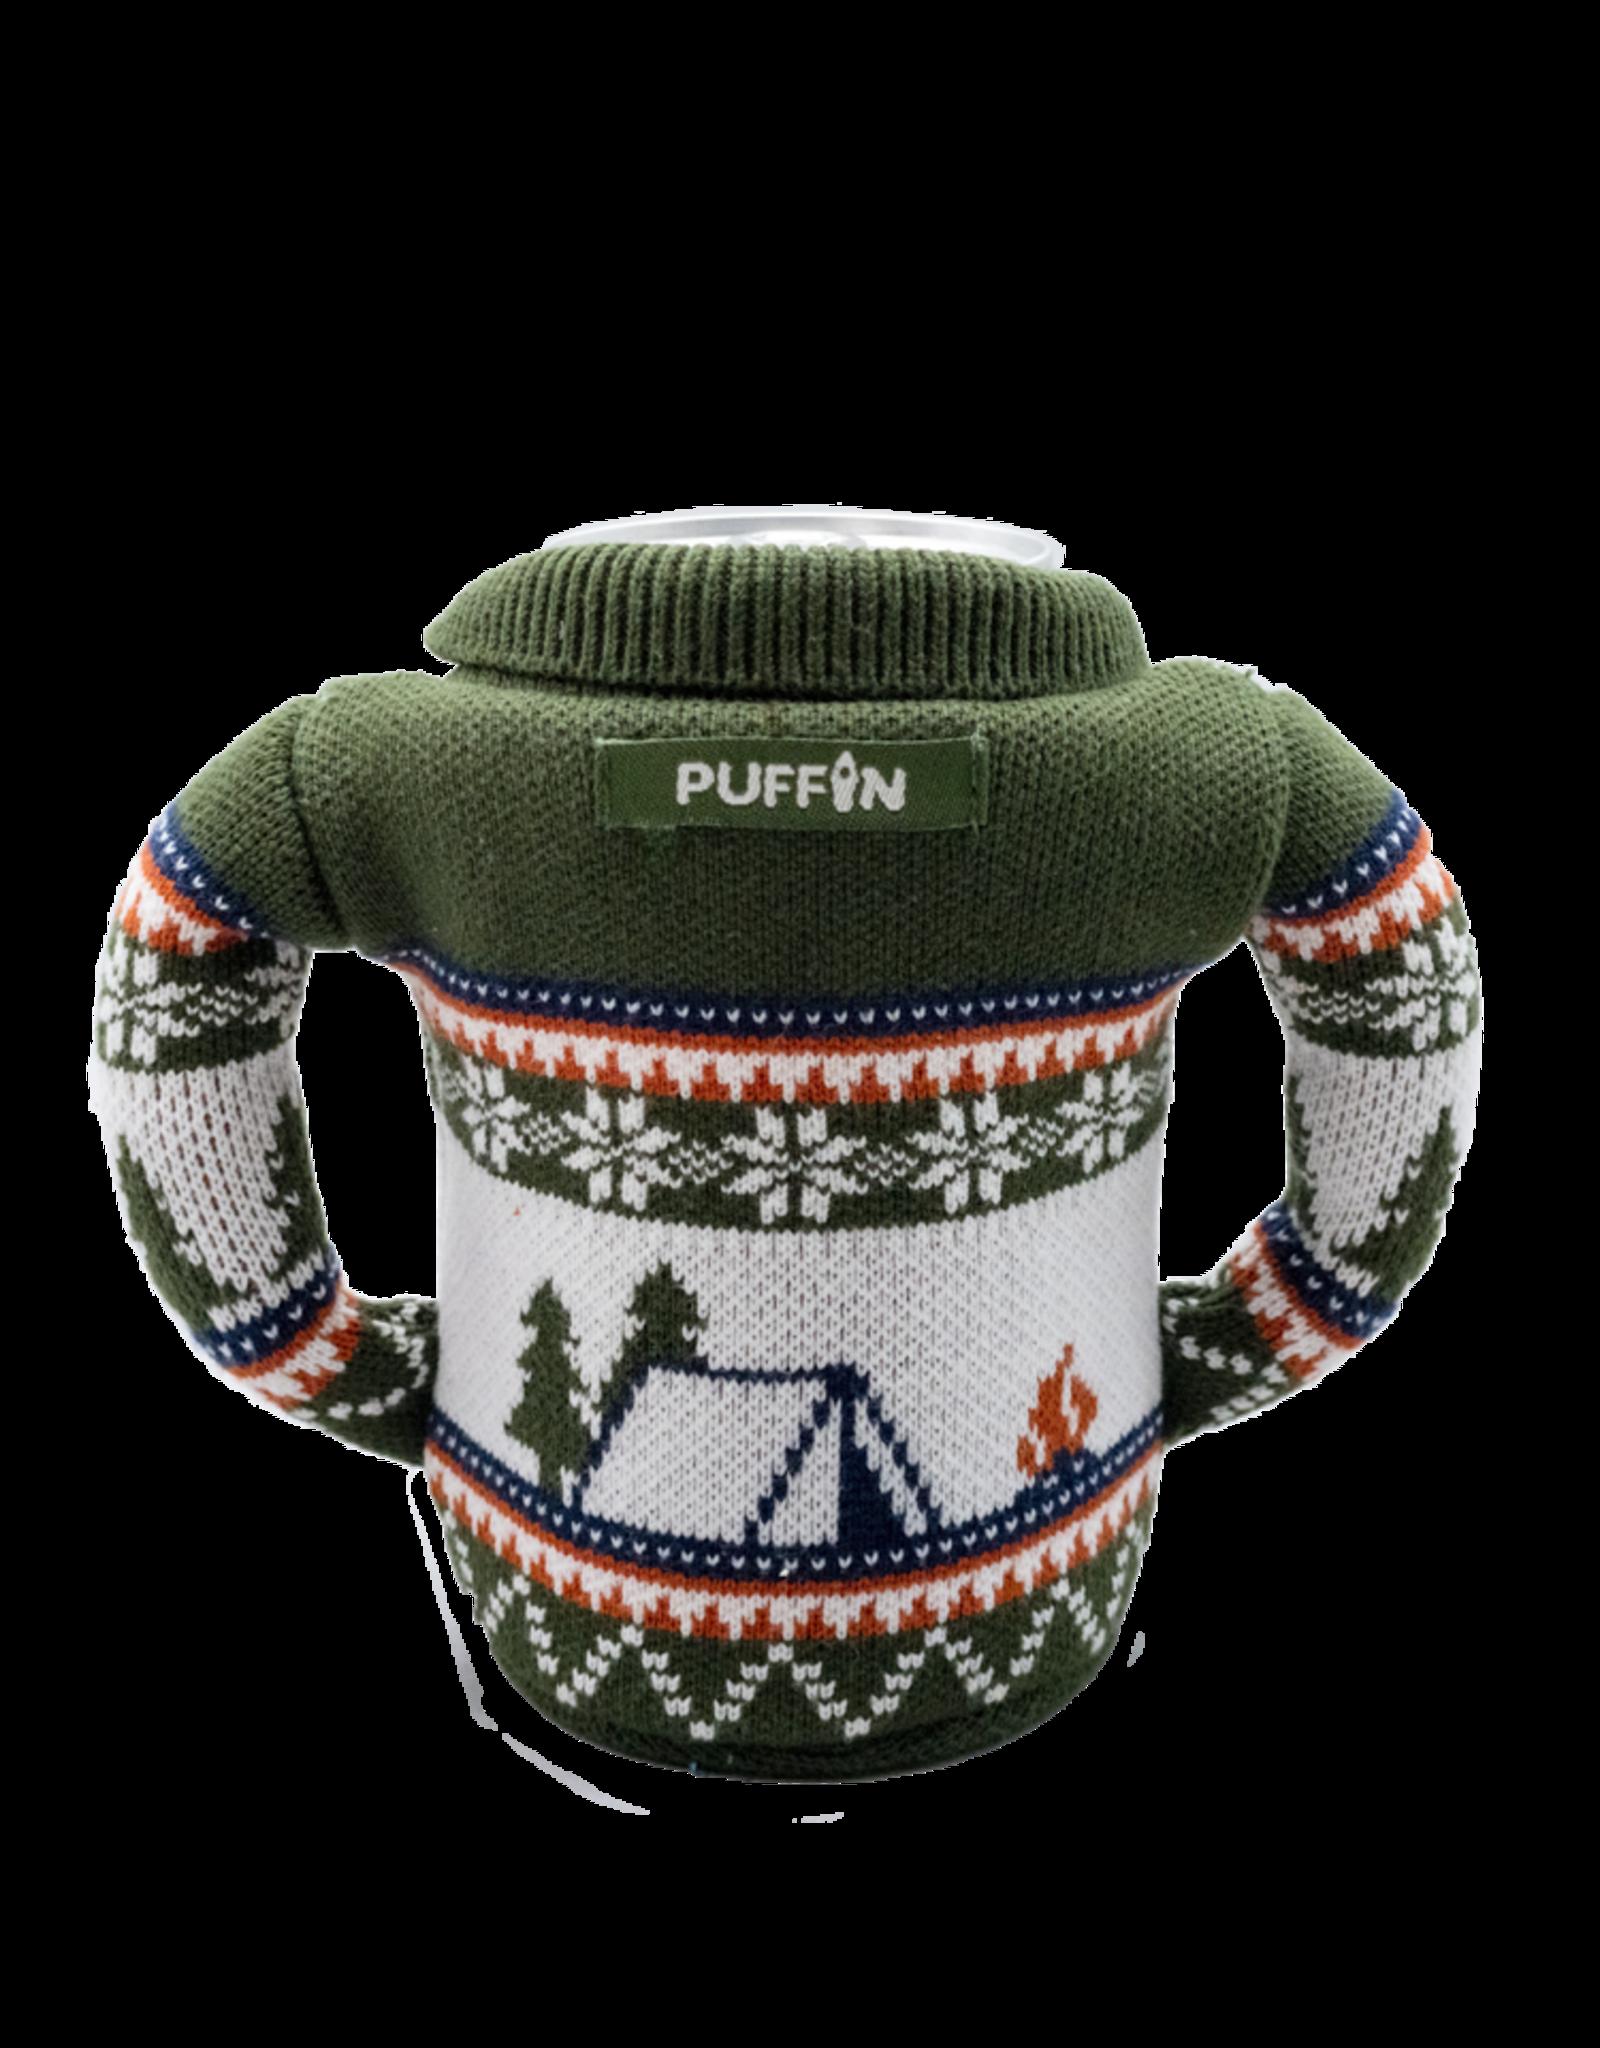 Puffin PUFFIN BEVERAGE SWEATER